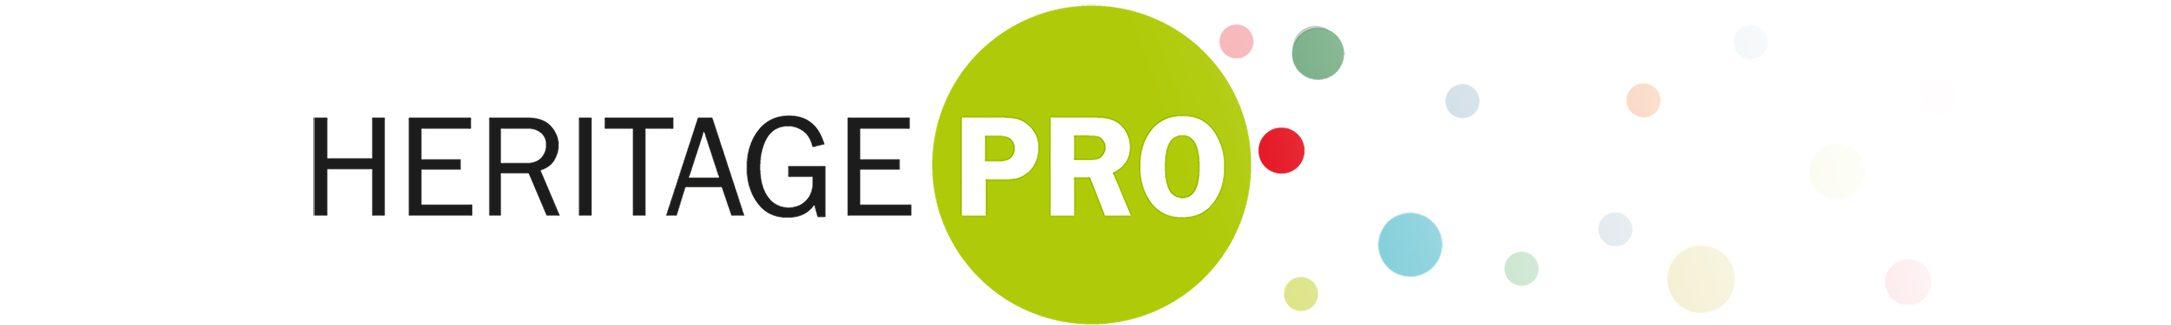 HERITAGE-PRO